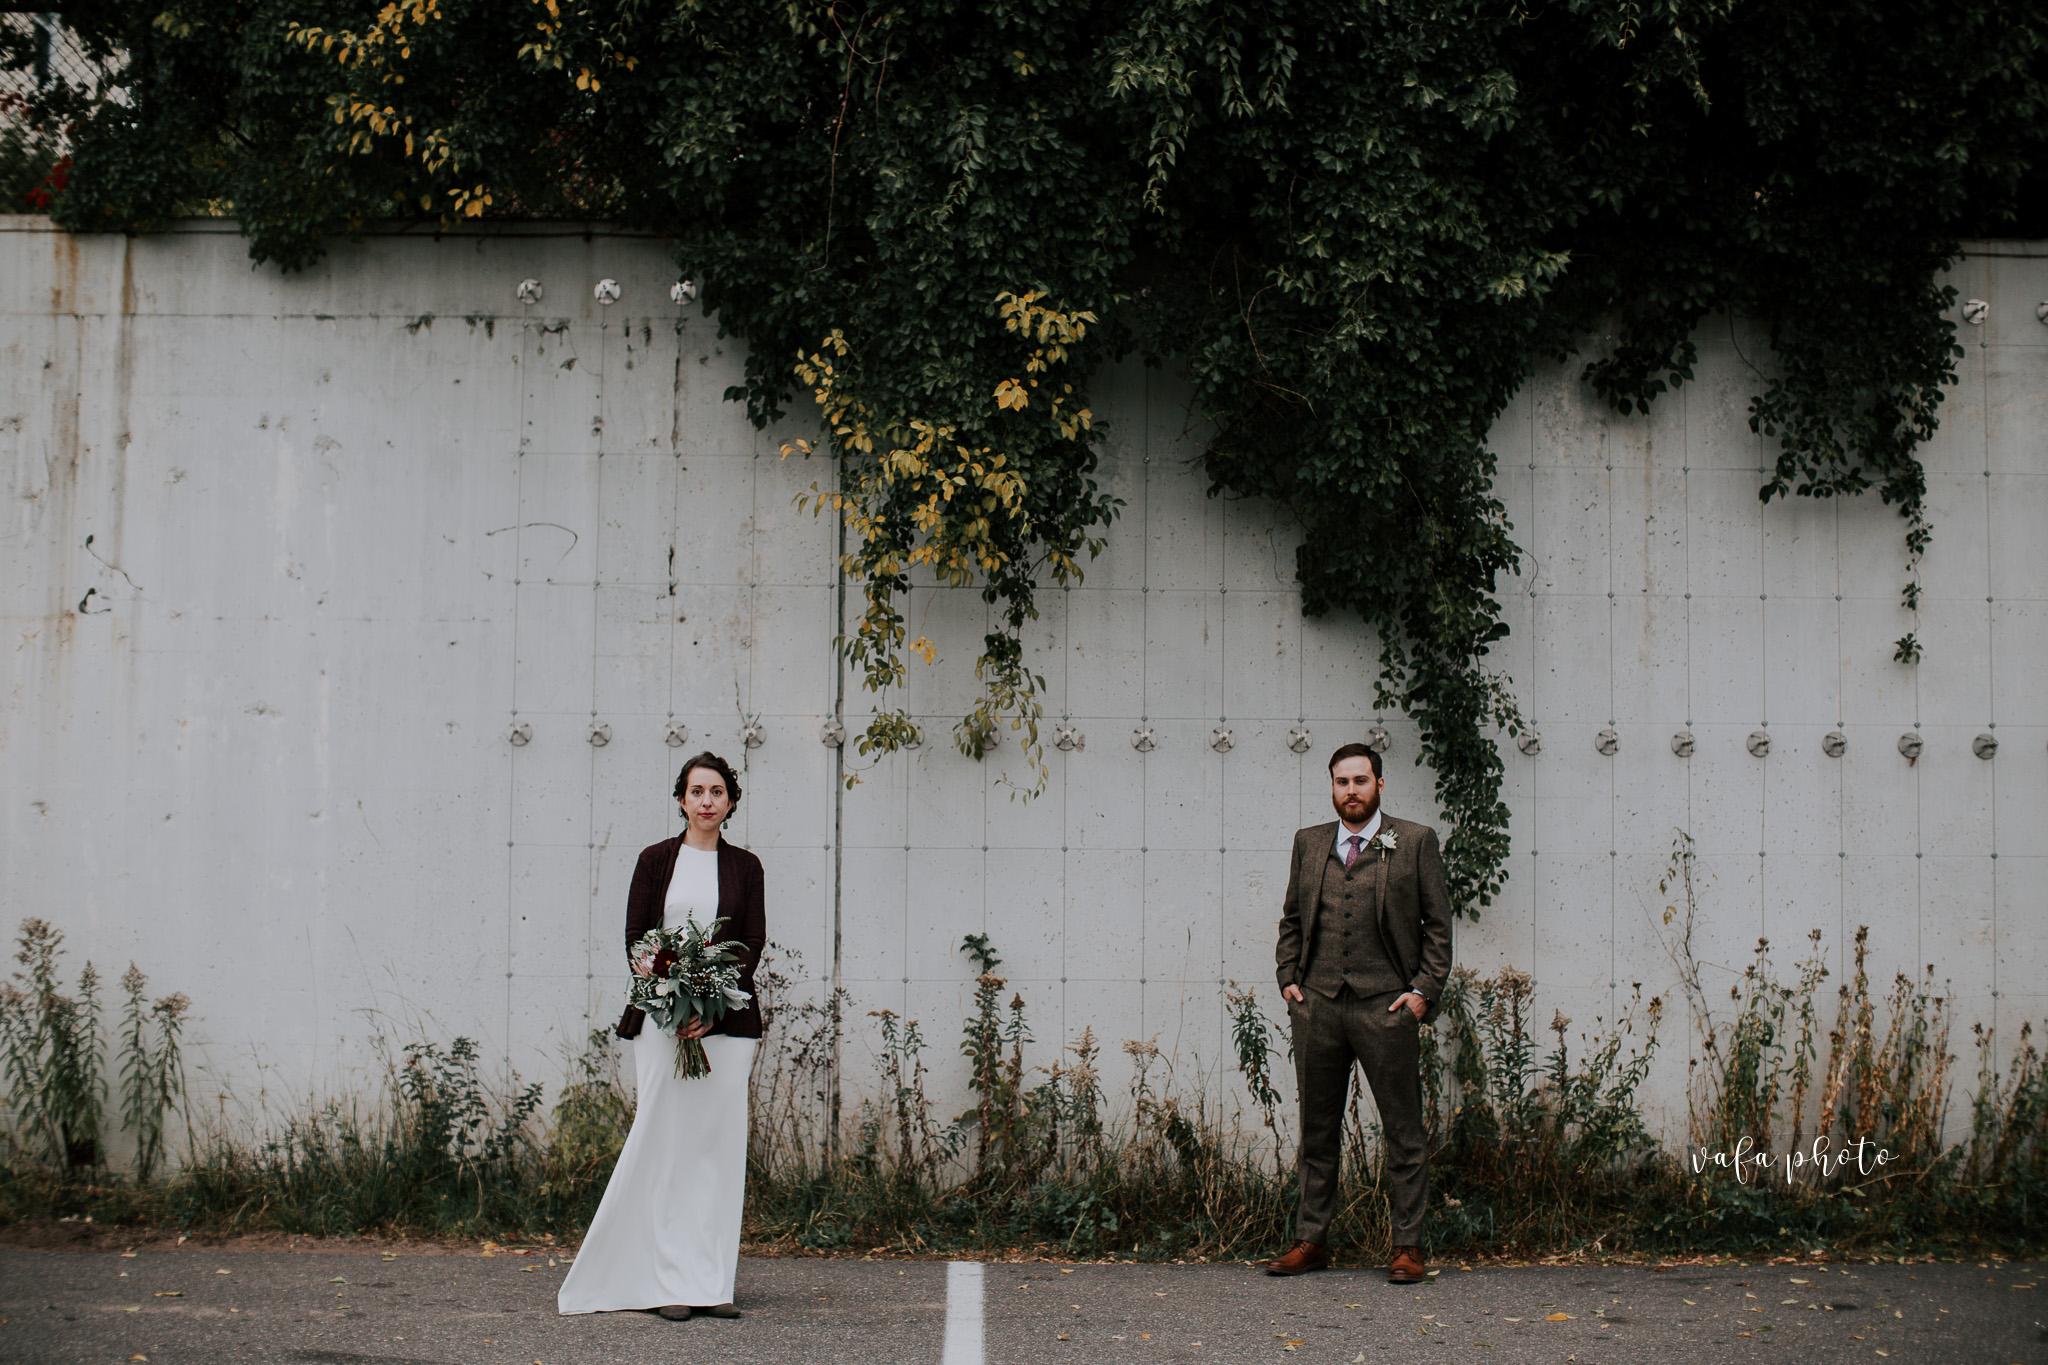 Little-Presque-Isle-Michigan-Wedding-Kim-Kyle-Vafa-Photo-471.jpg